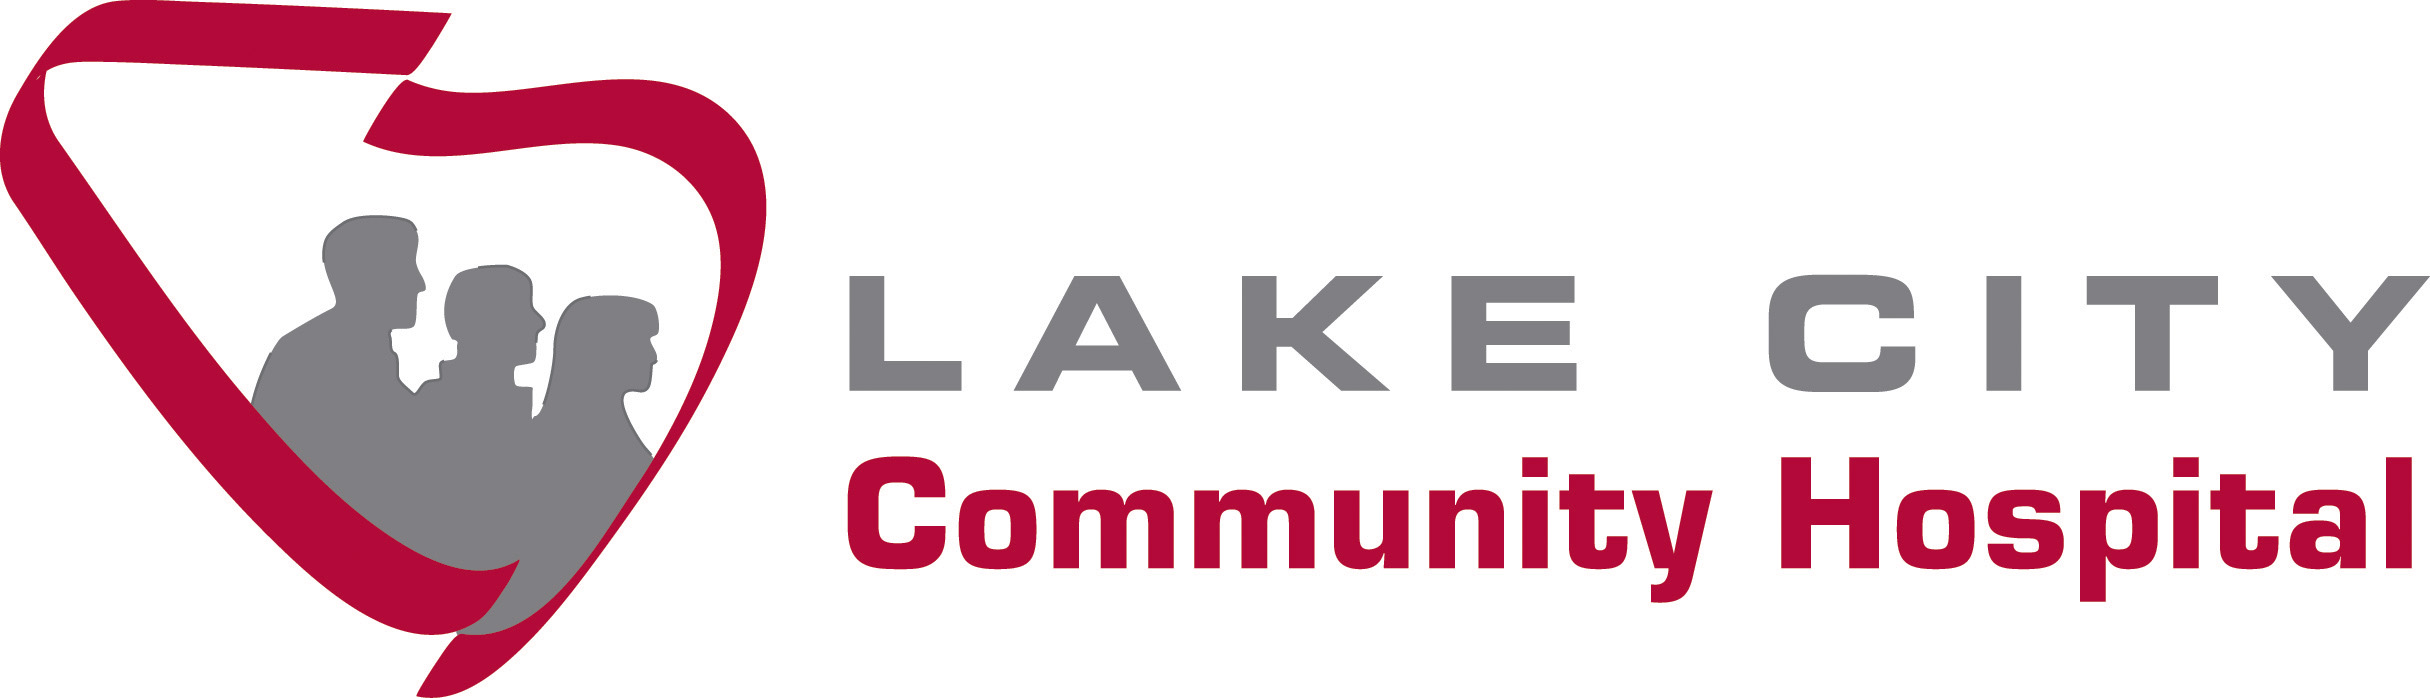 A photo of Lake City Community Hospital